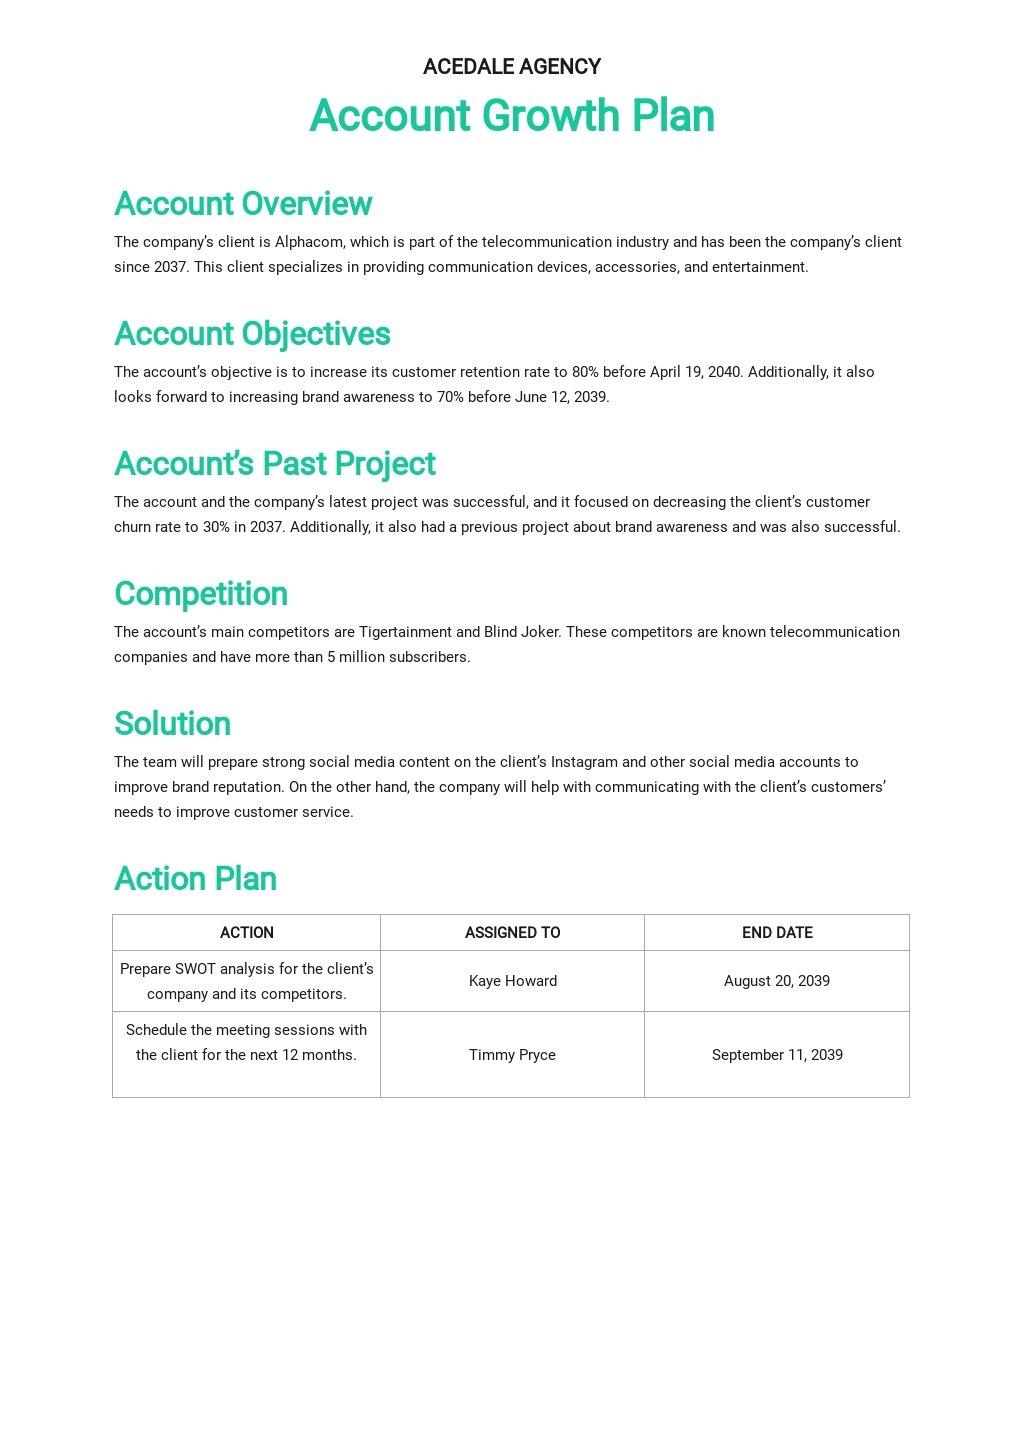 Account Growth Plan Template.jpe